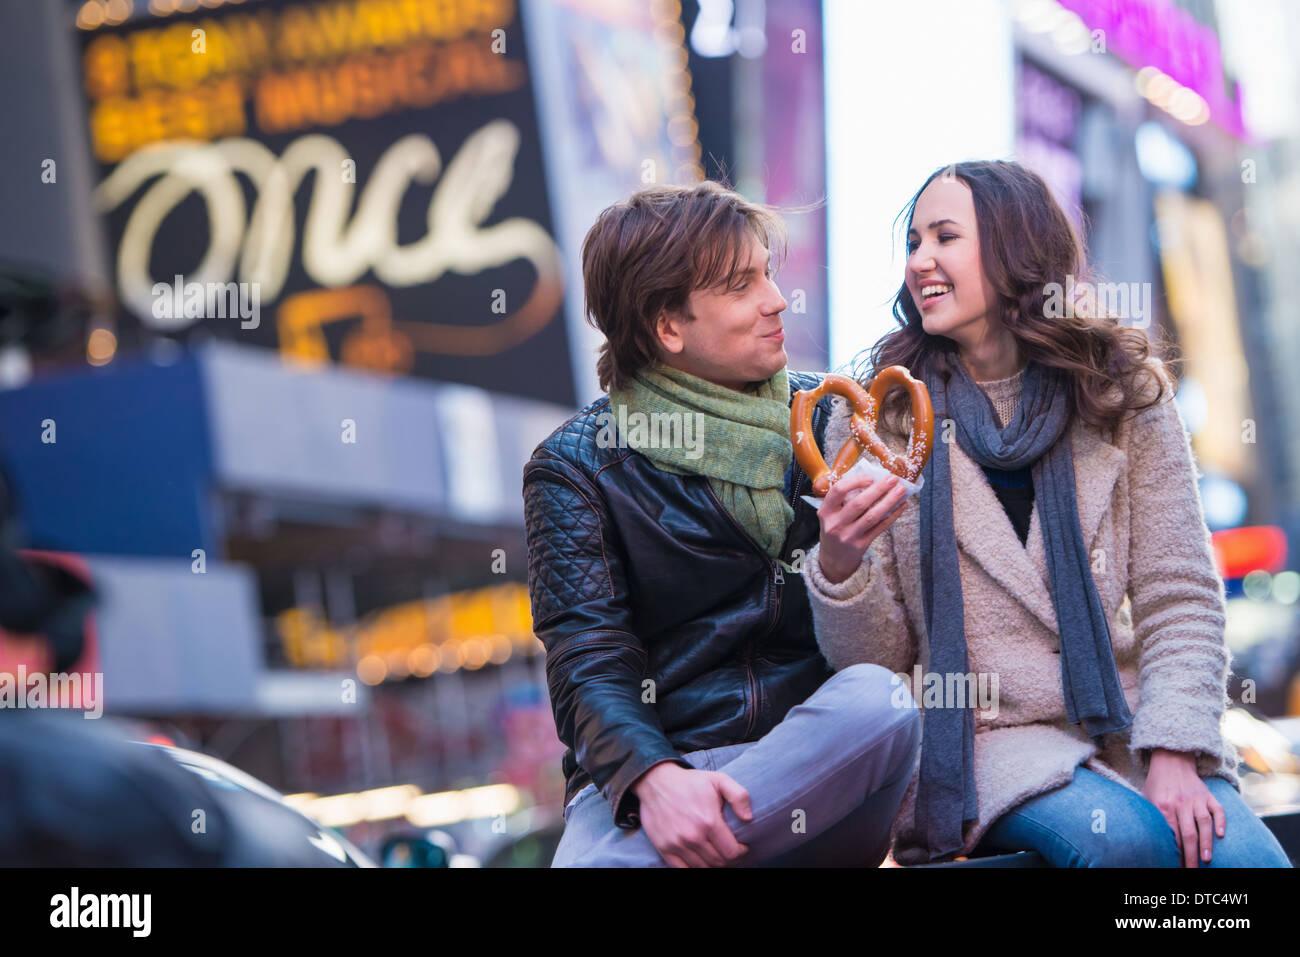 Junges Paar teilen Brezel, New York City, USA Stockbild